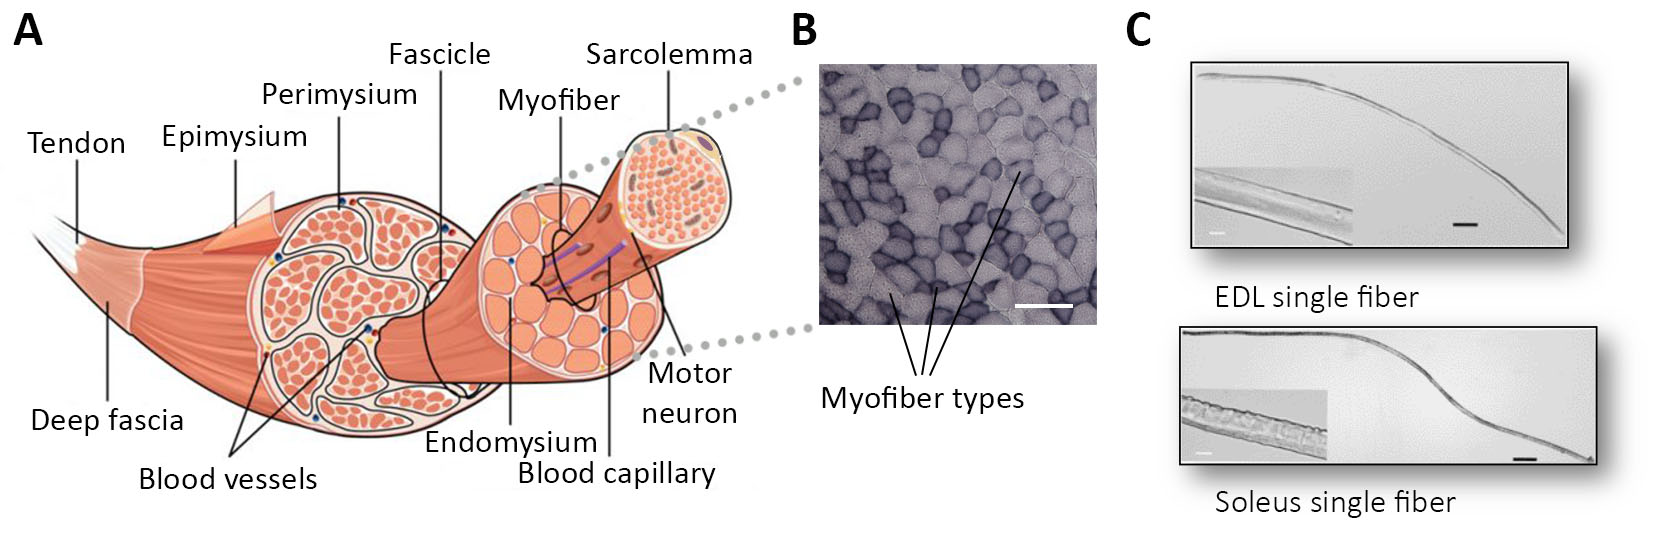 Isolation and Transcriptomic Profiling of Single Myofibers